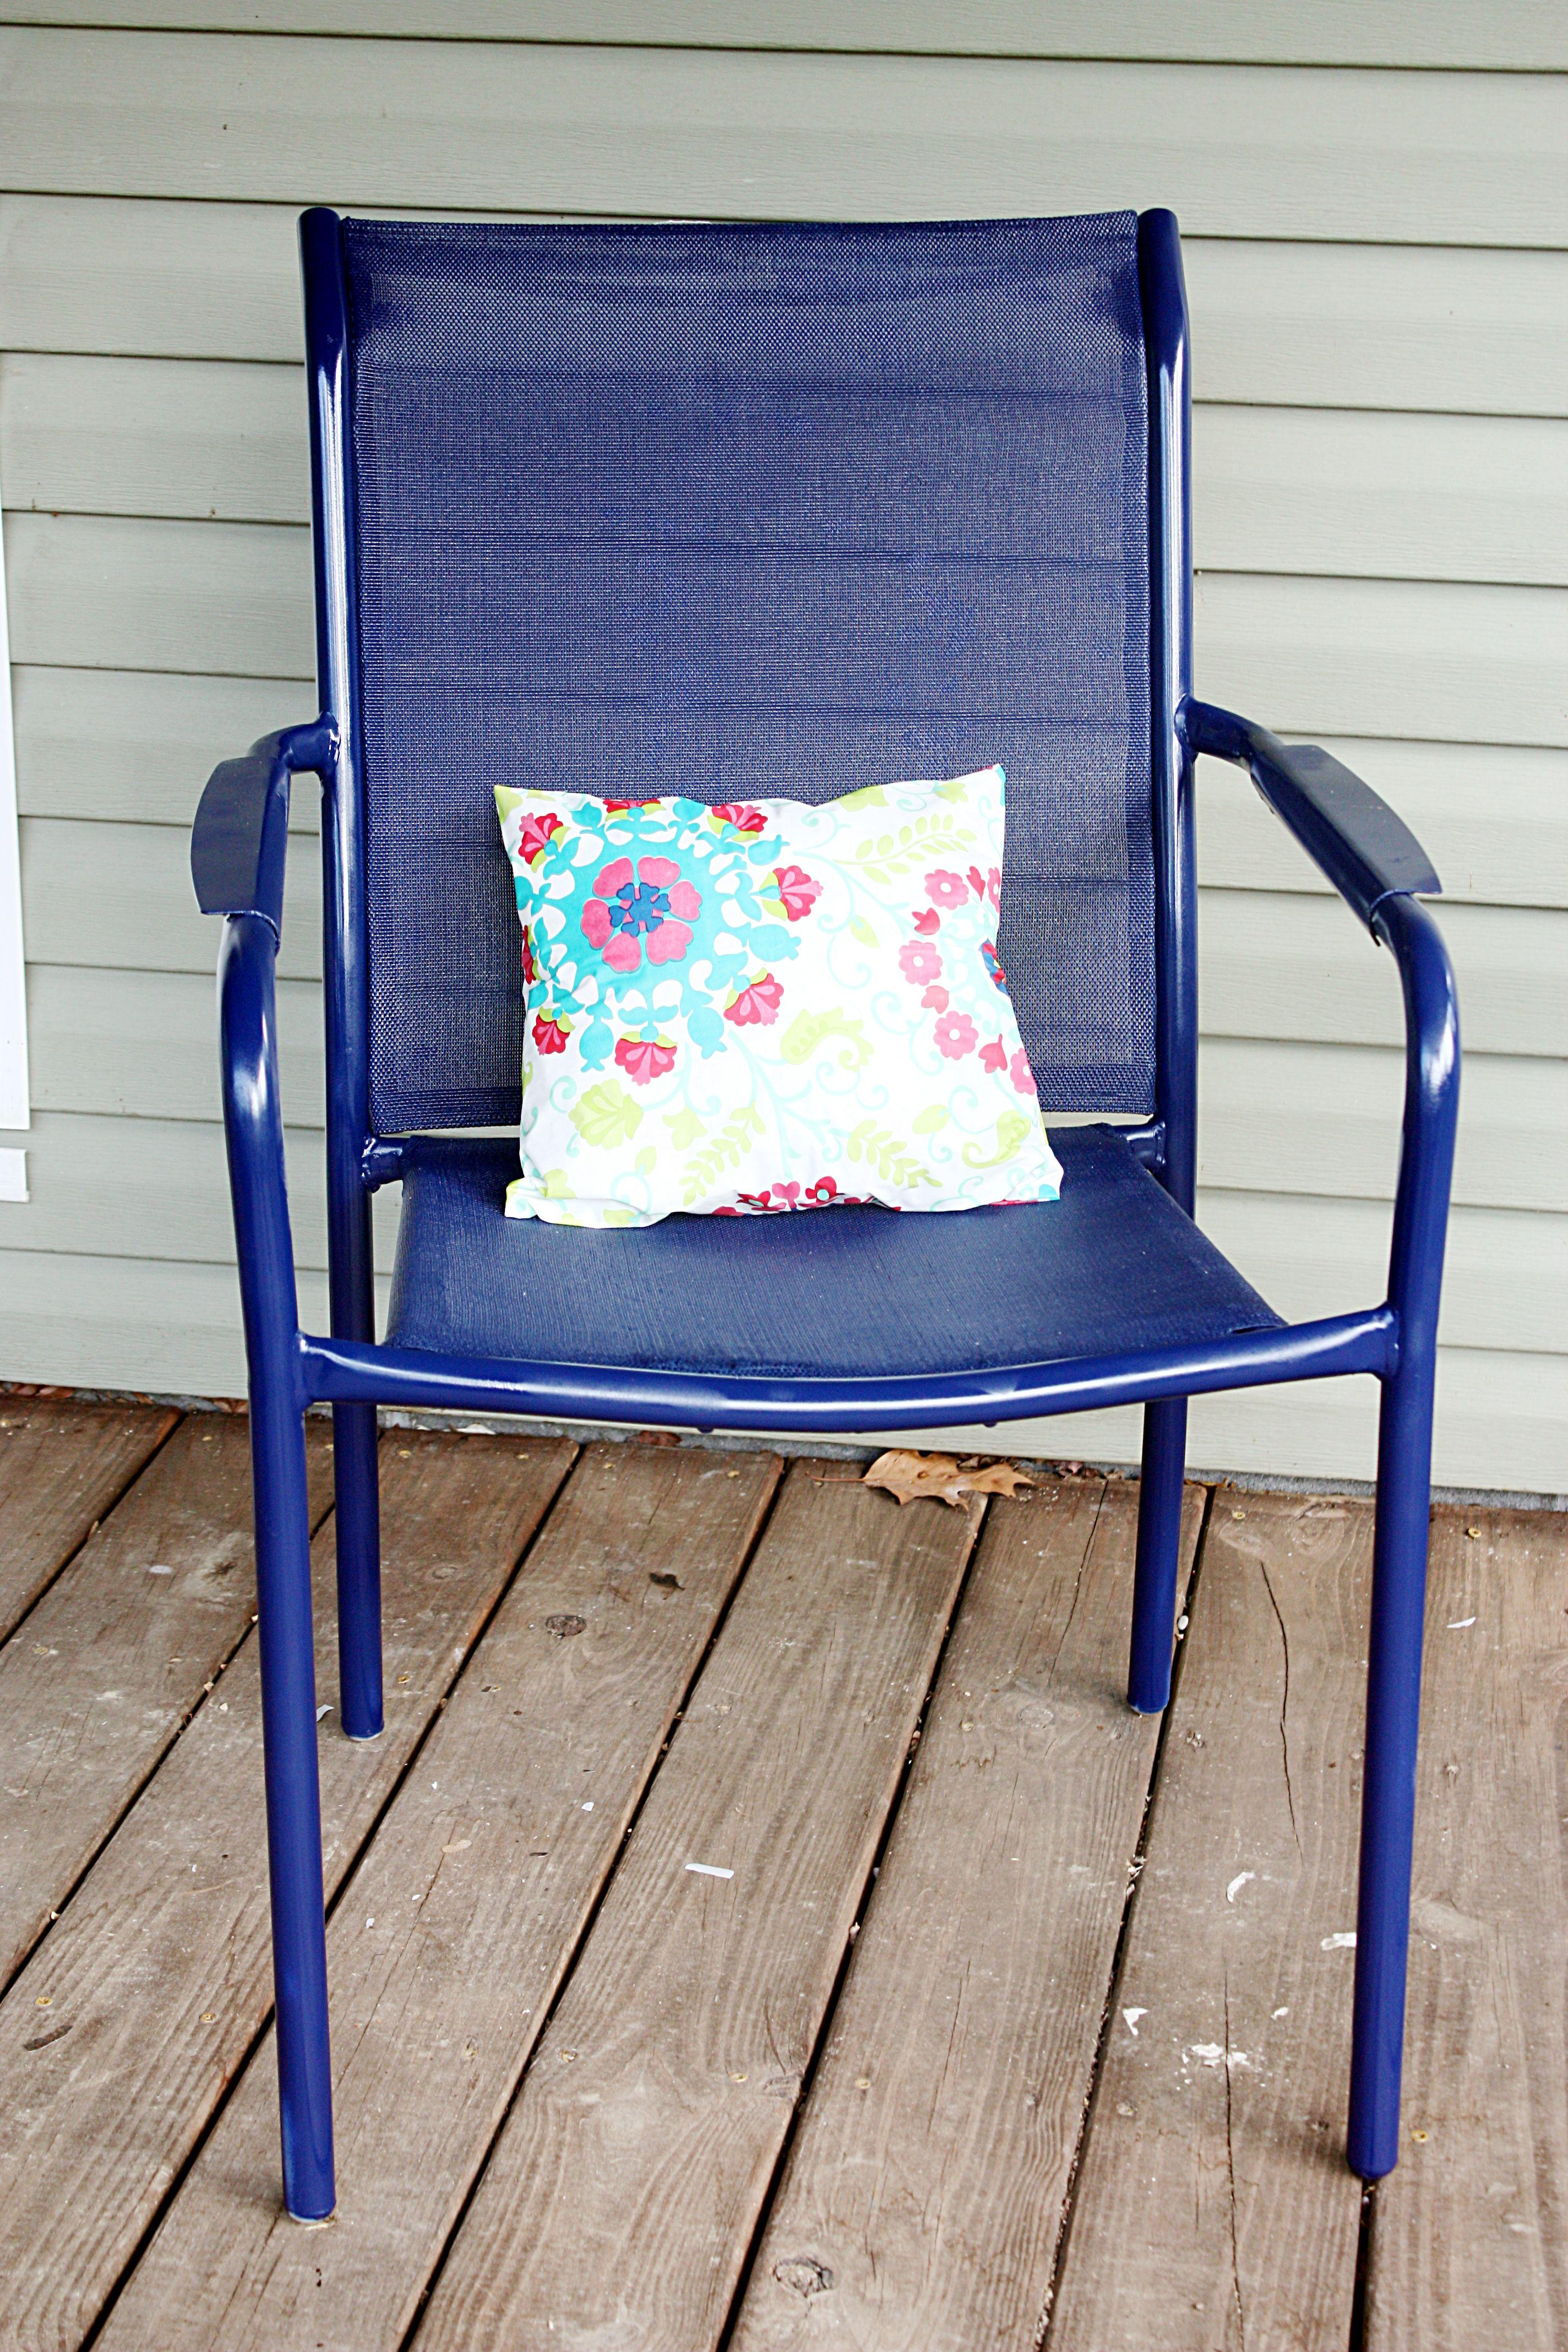 Deck chair redo. Spray paint porch chair. Spray paint outdoor chair. Blue outdoor chair. Life on a Gravel Road